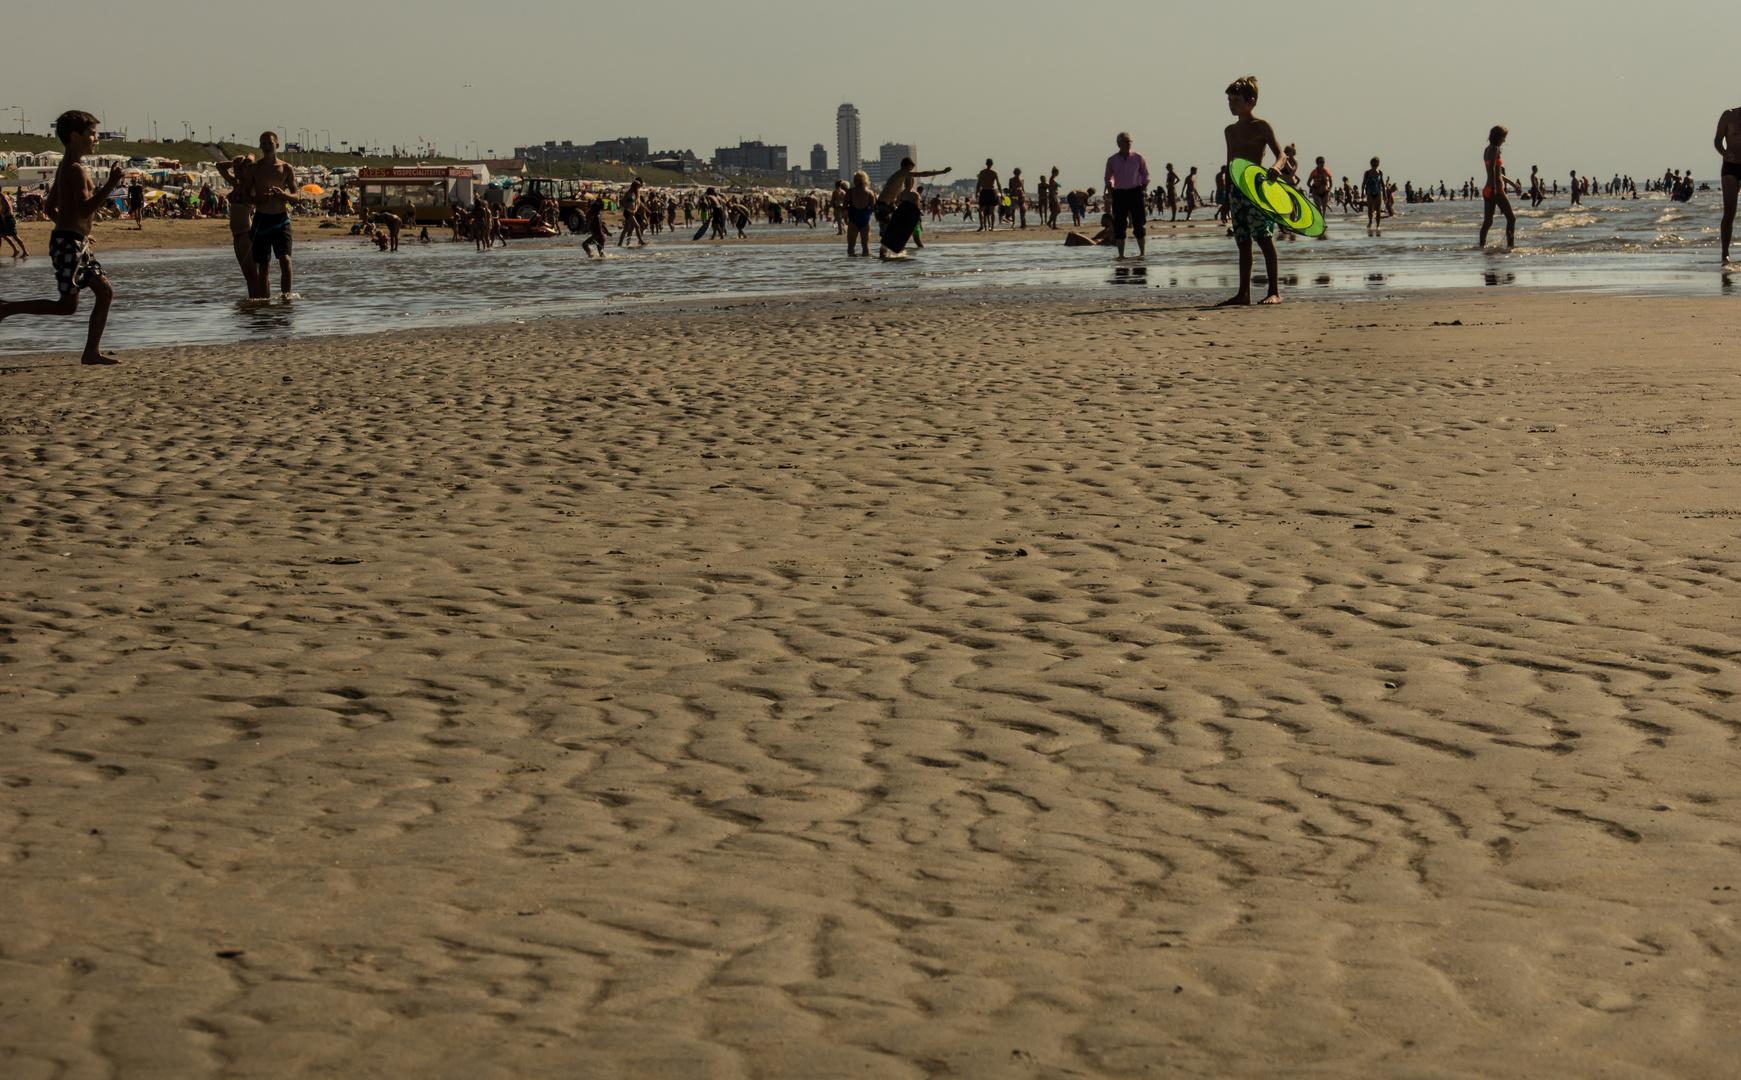 Nachmittags Ebbe - Bloemendaal aan Zee/Niederlande